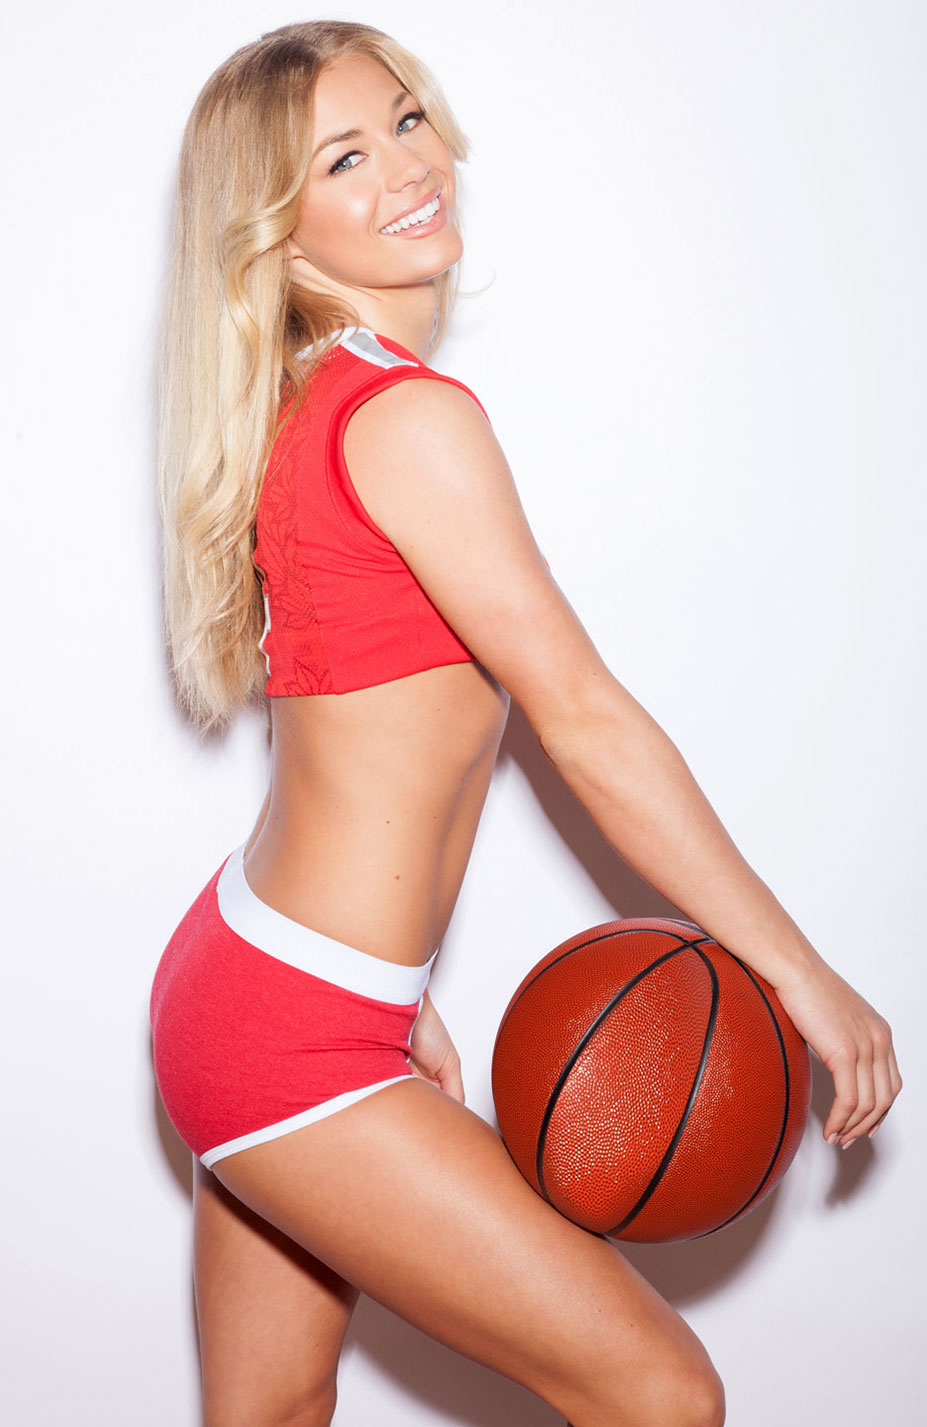 Никки Ли играет в баскетбол в форме команды Ohio State Buckeyes / Nikki Leigh - College Basketball